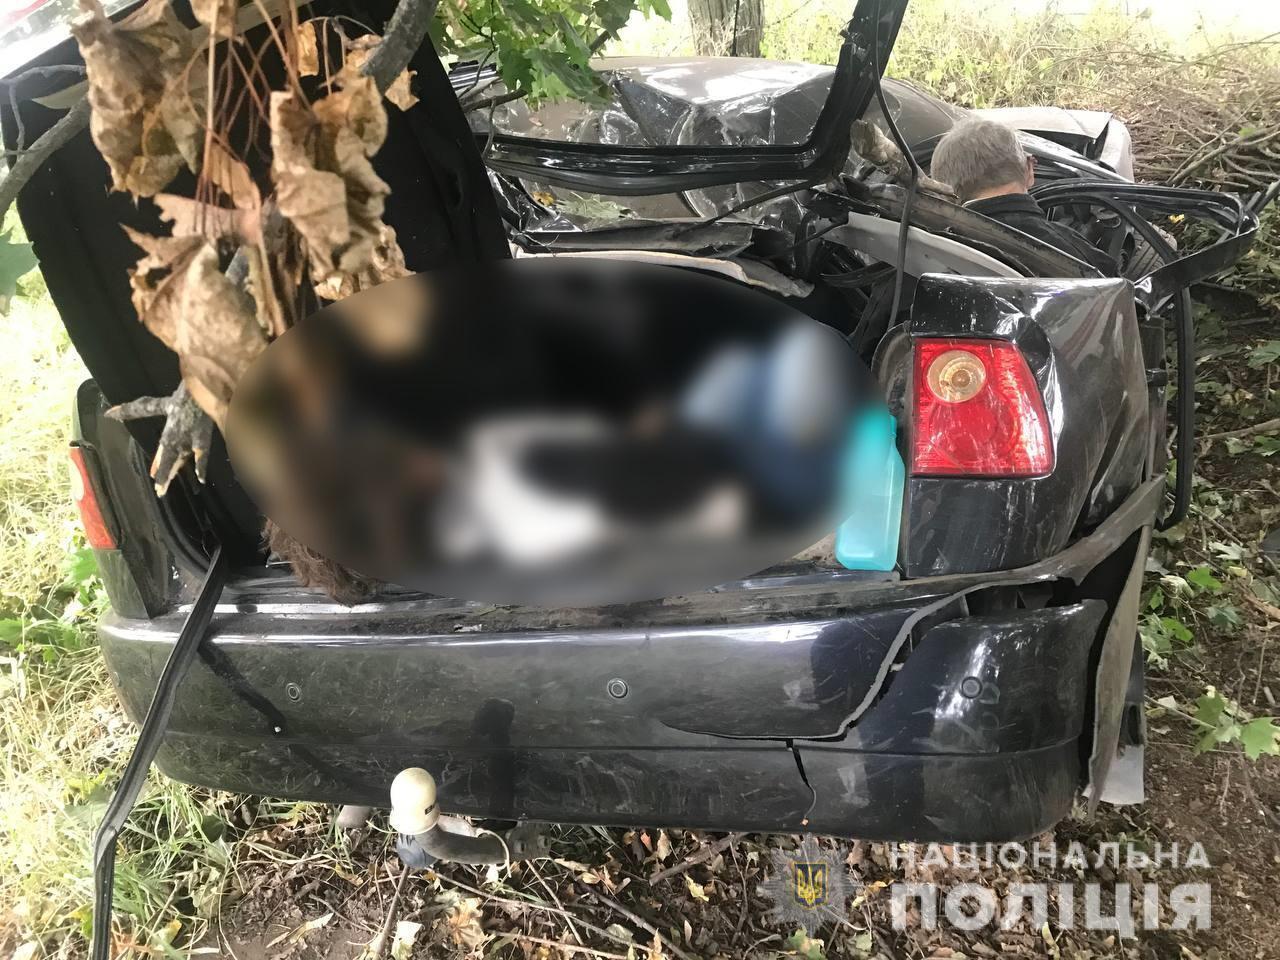 Загибла пасажирка в багажнику авто